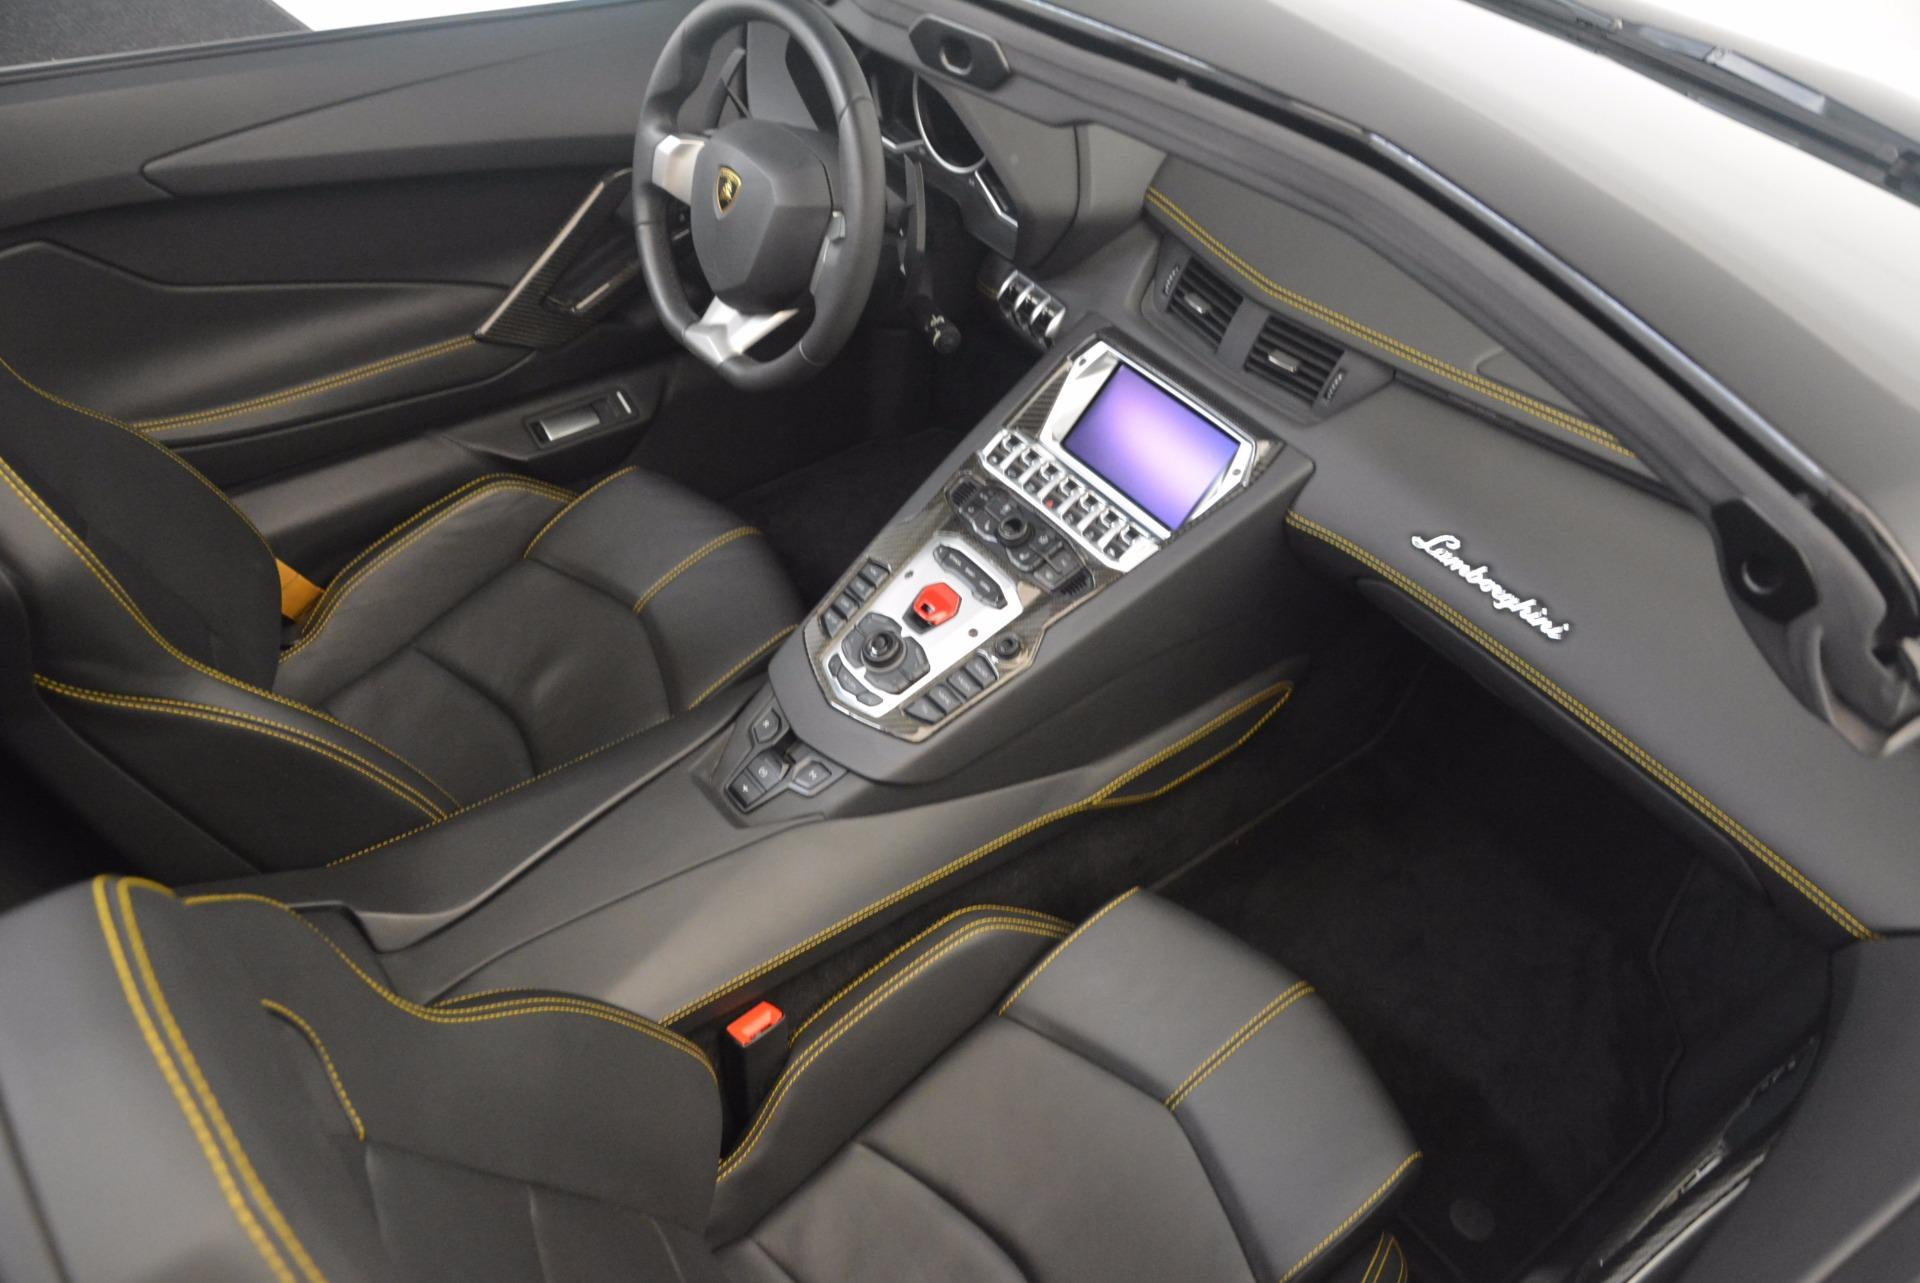 Used 2015 Lamborghini Aventador LP 700-4 For Sale In Westport, CT 1217_p27